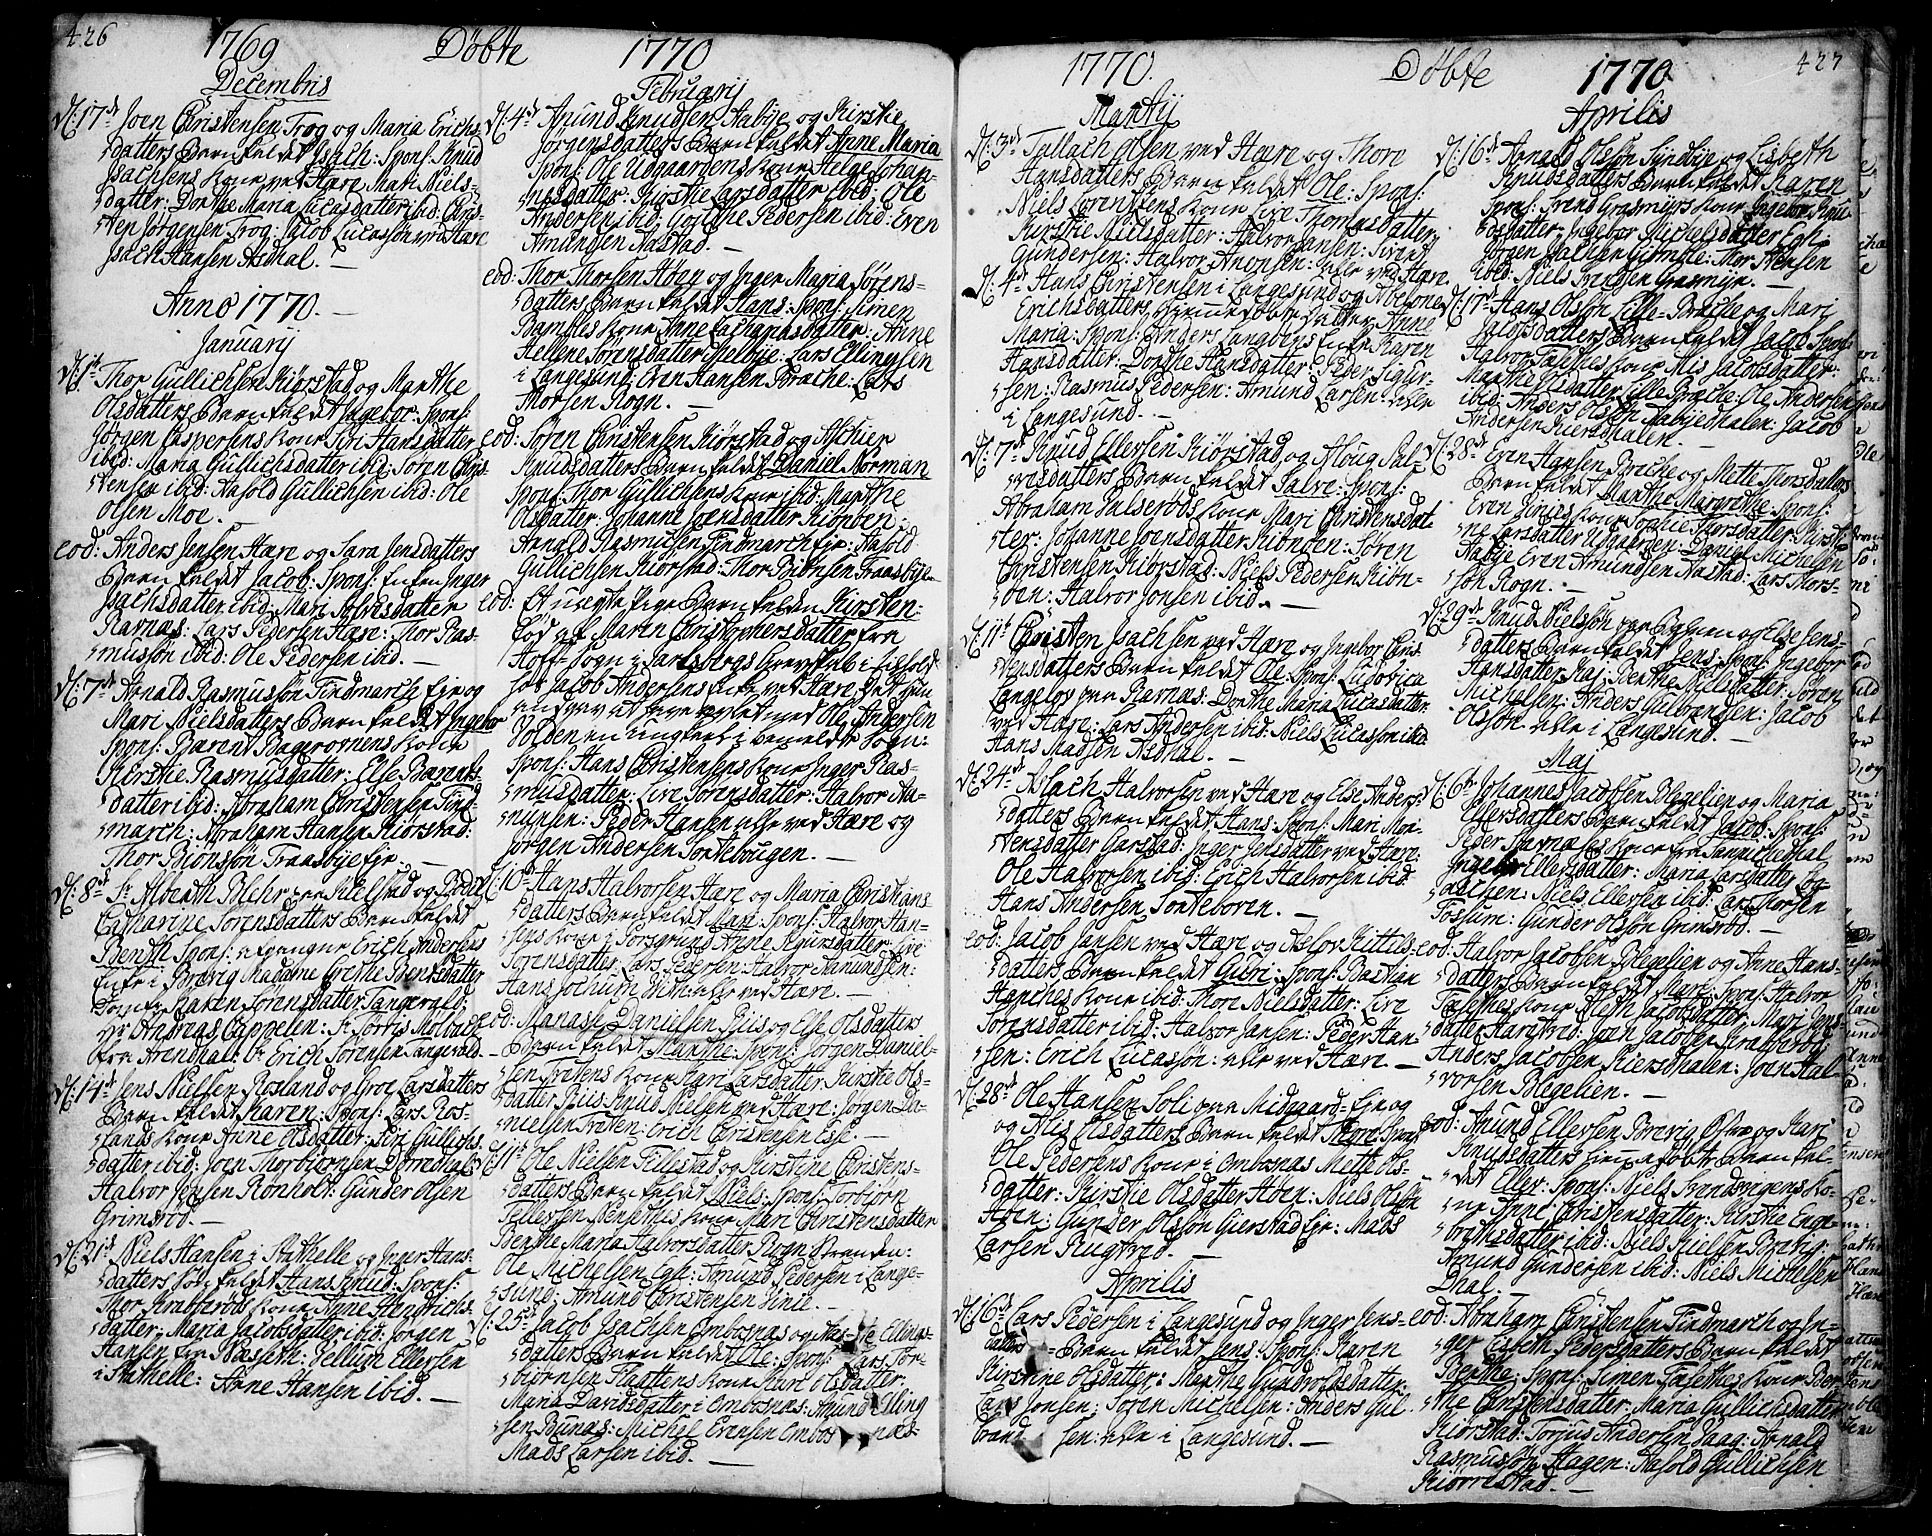 SAKO, Bamble kirkebøker, F/Fa/L0001: Ministerialbok nr. I 1, 1702-1774, s. 426-427